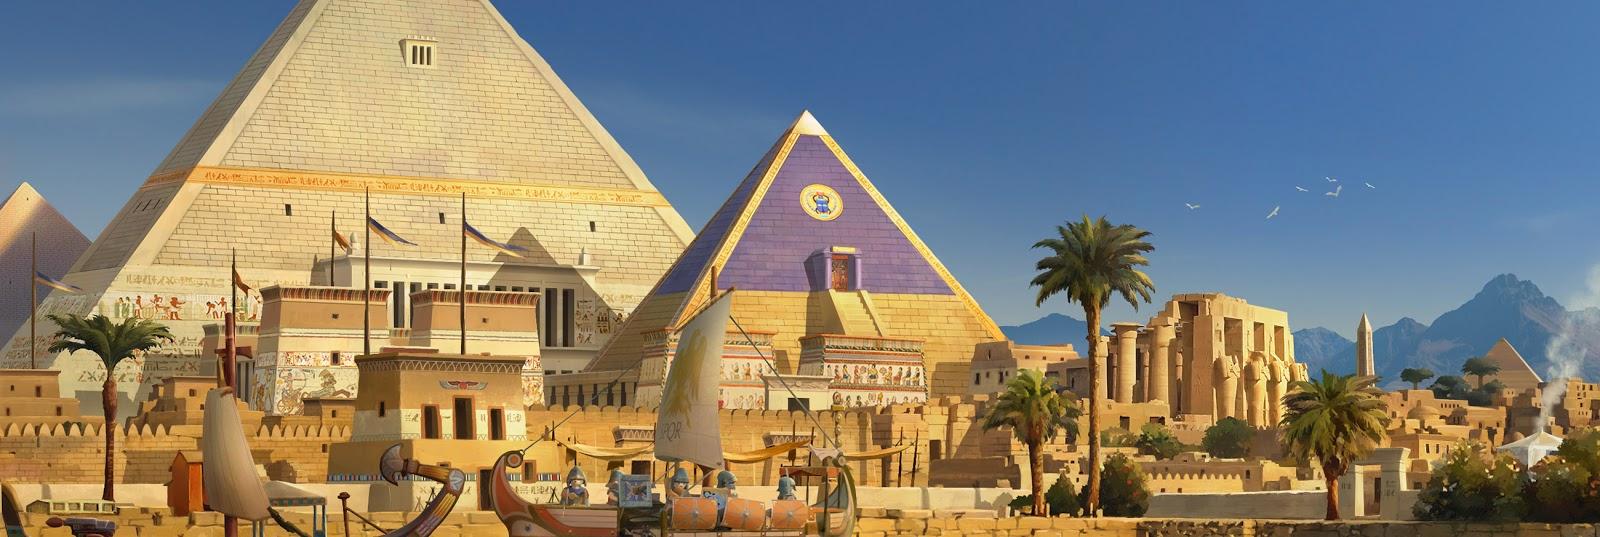 Playmobil-Harborandpyramid-blog-detail-01.jpg